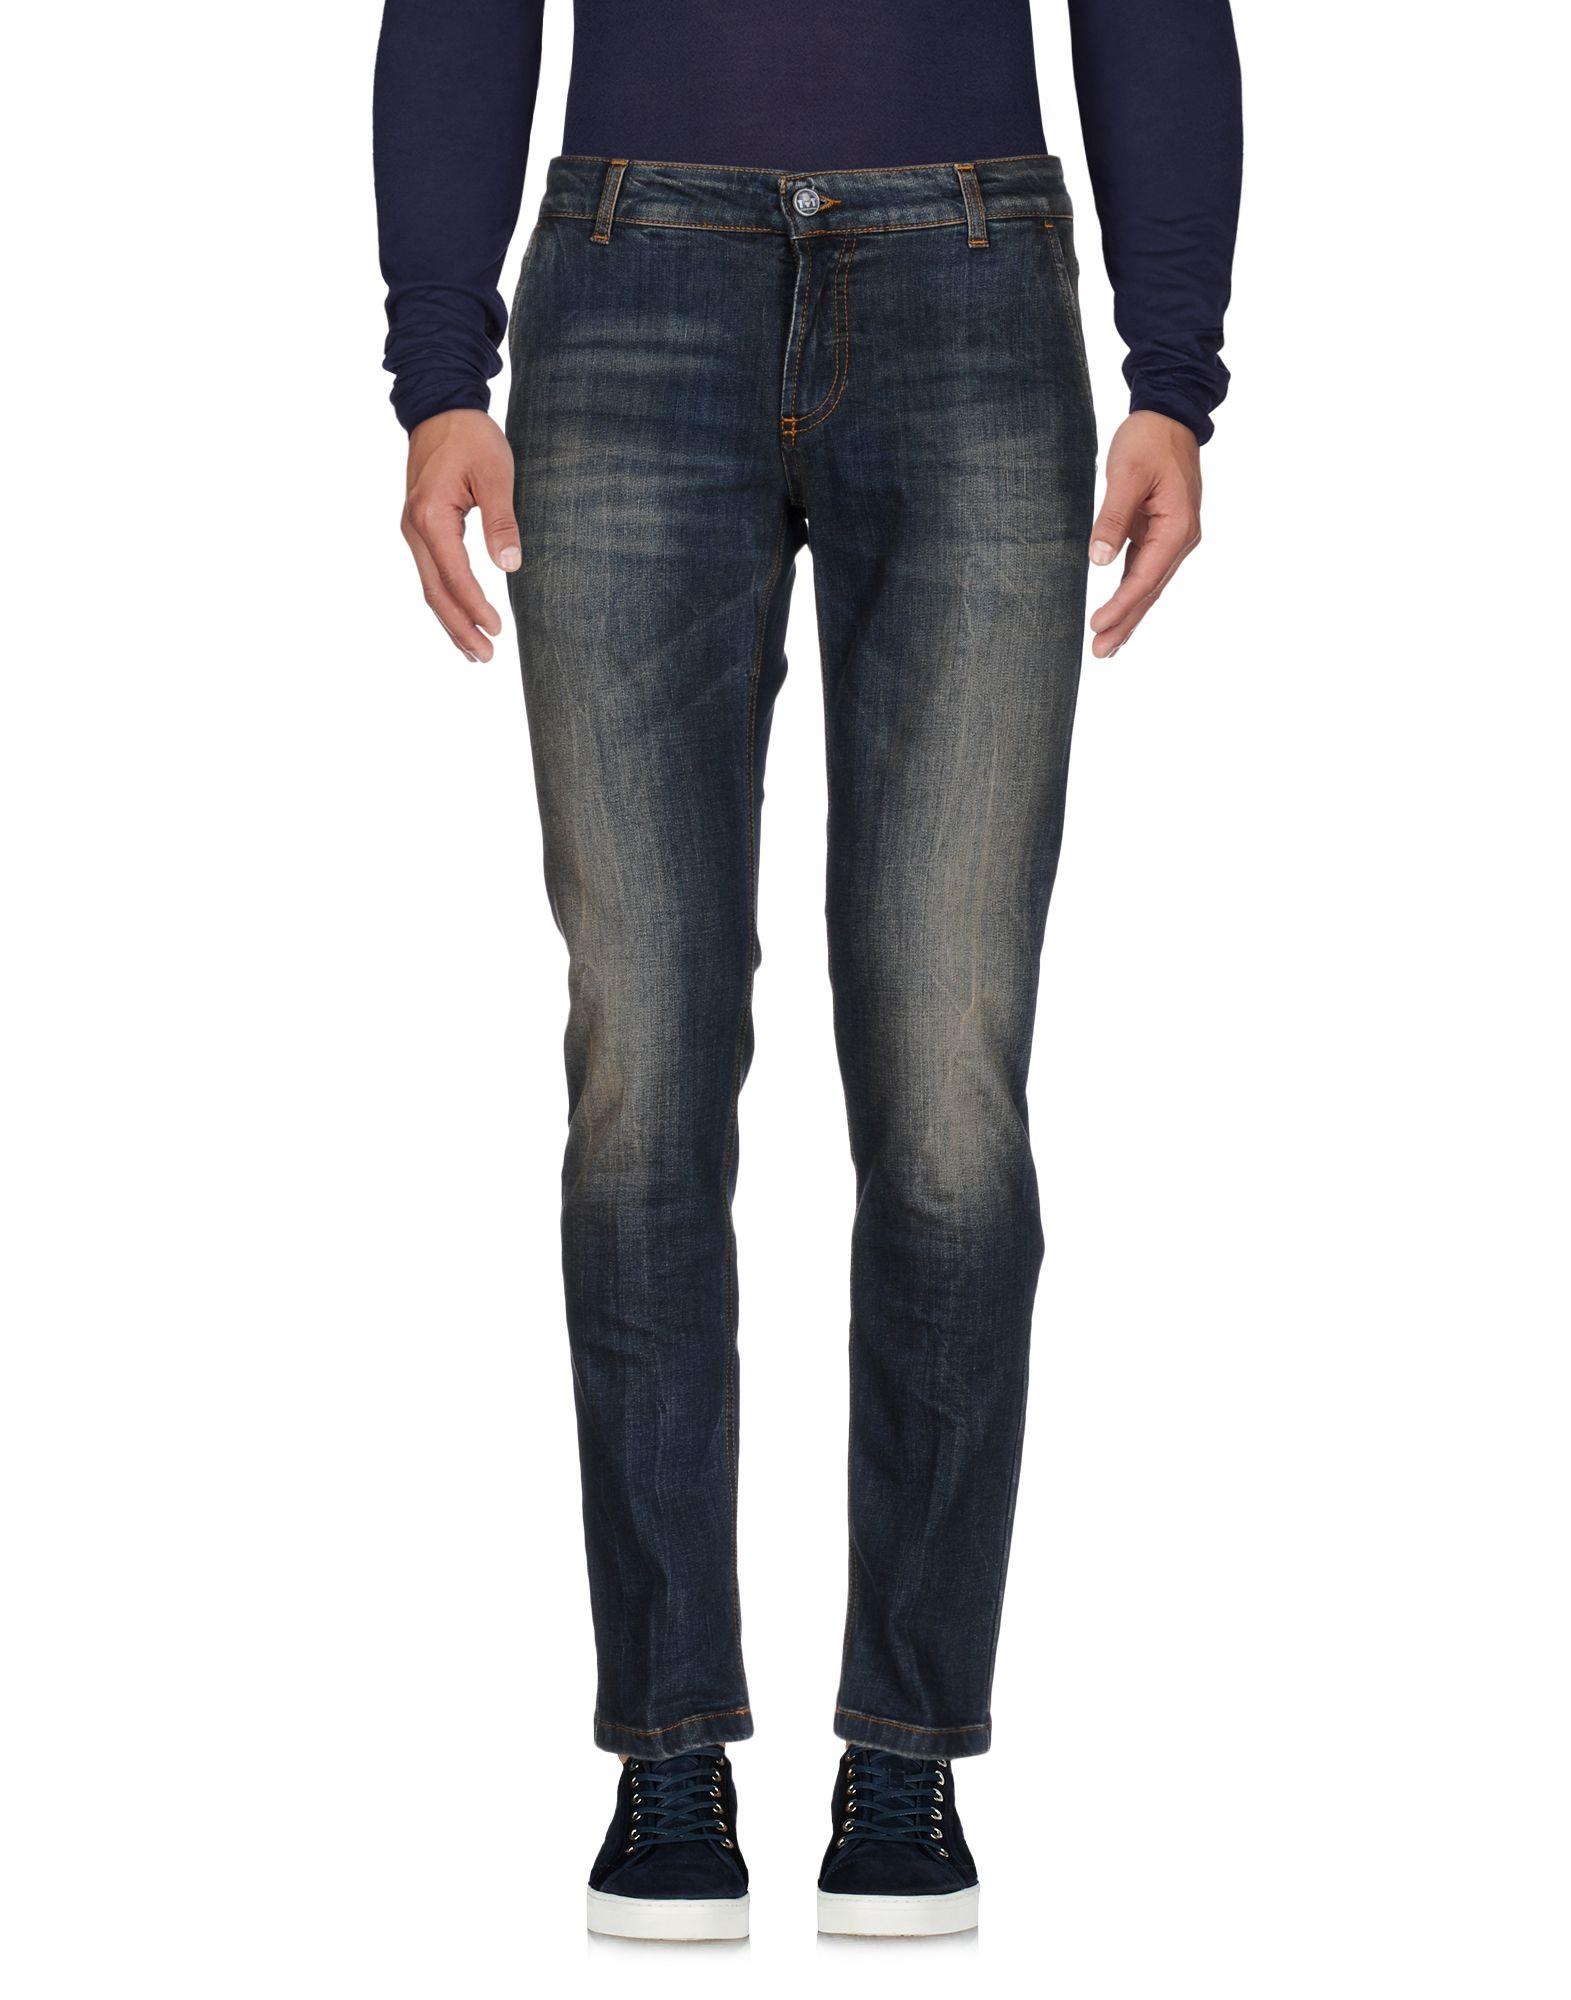 Pantaloni Jeans Entre Amis Uomo Uomo Uomo - 42613011HD 6a2938